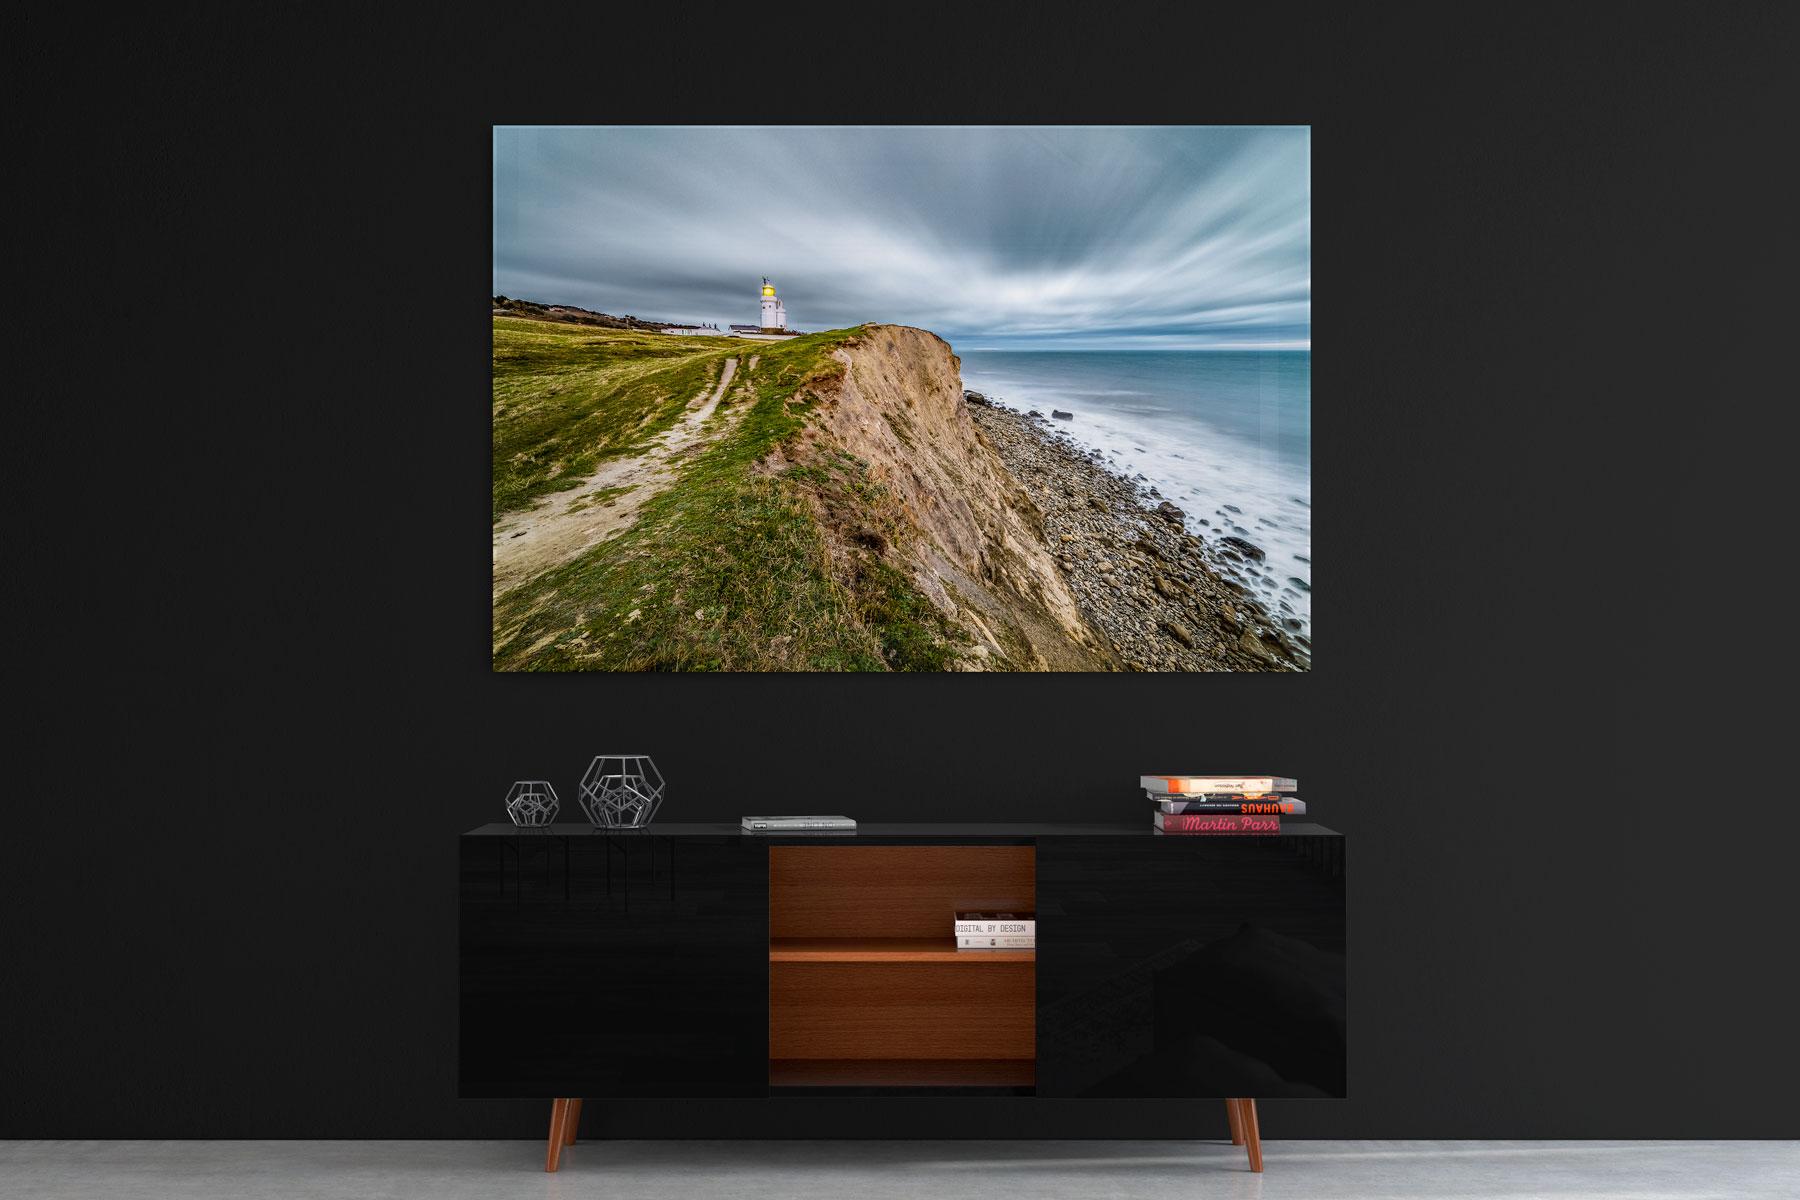 St-Catherine's-Lighthouse-Cliffs.jpg